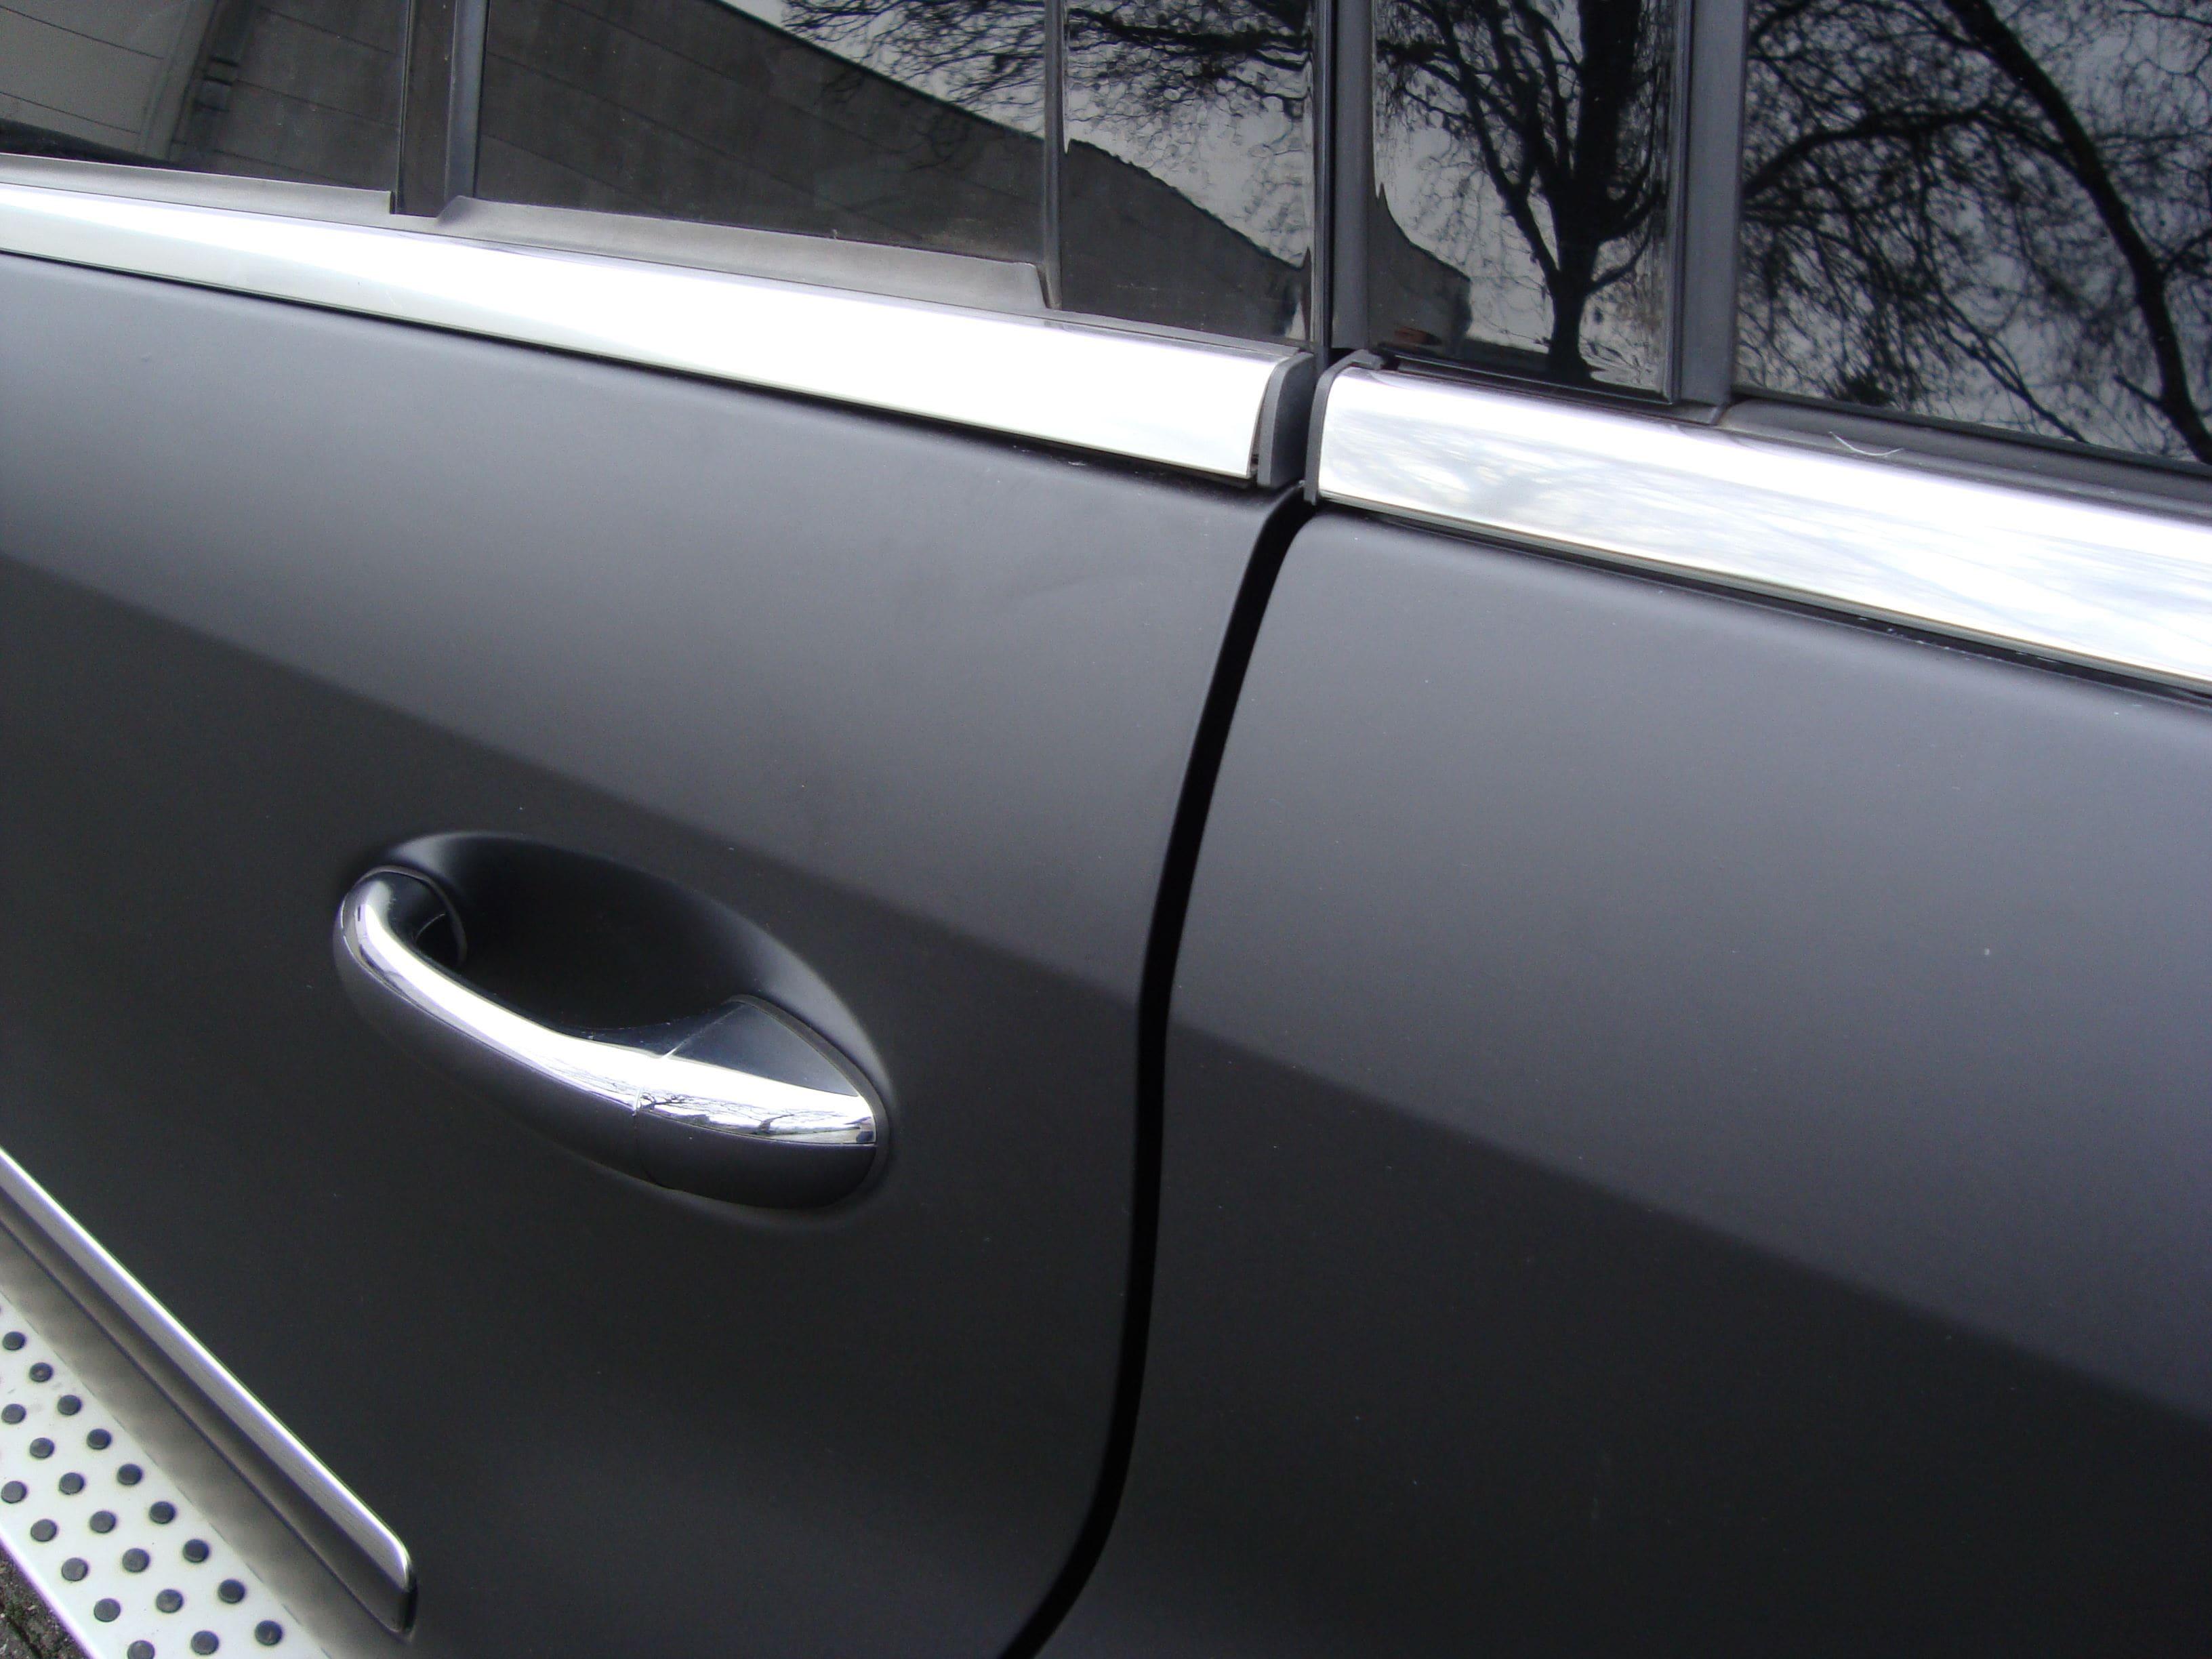 Mercedes GL met Mat Zwarte Wrap, Carwrapping door Wrapmyride.nu Foto-nr:6283, ©2020